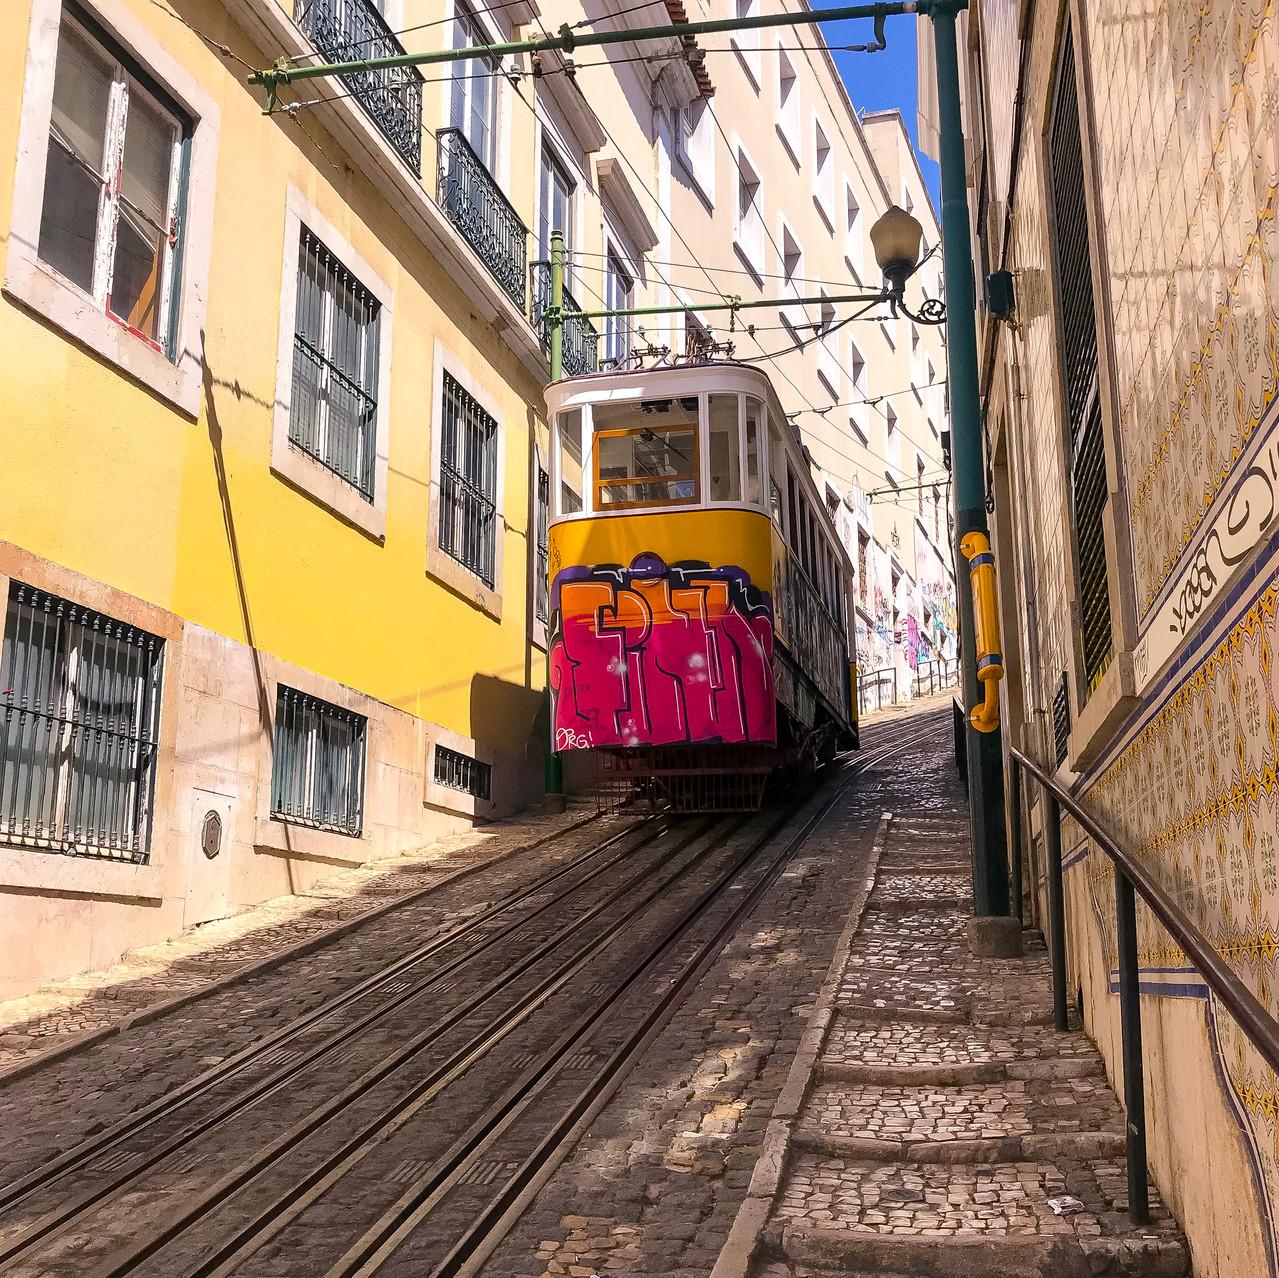 Trolley on a hill